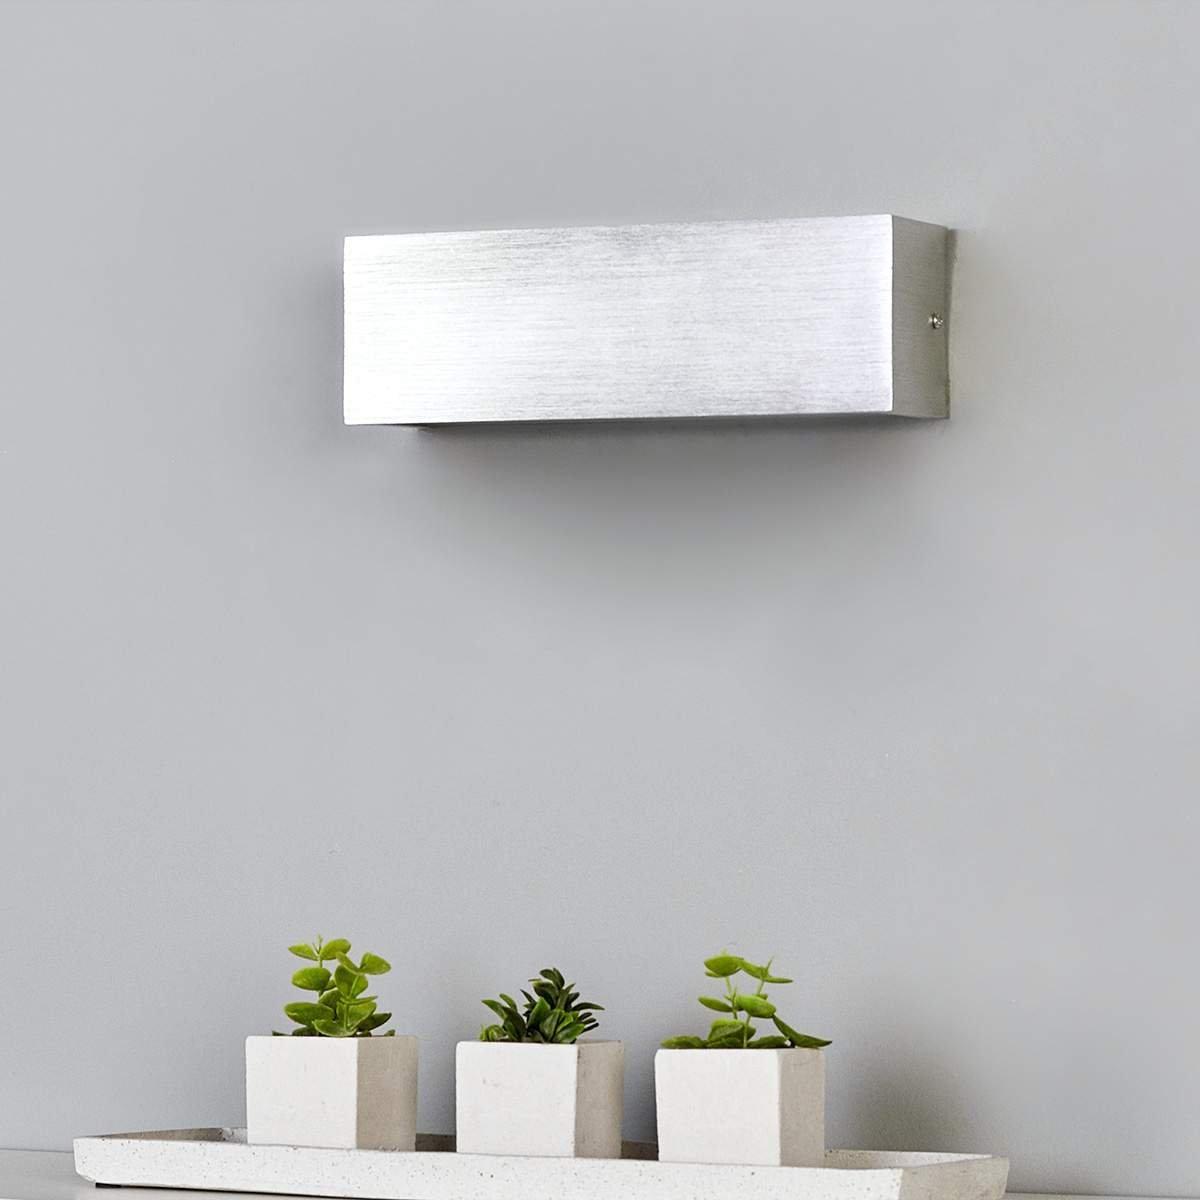 LED Wandleuchte Ranik Eckig Aluminium Alu-Wandlampe Wohnzimmer Lampenwelt Metall